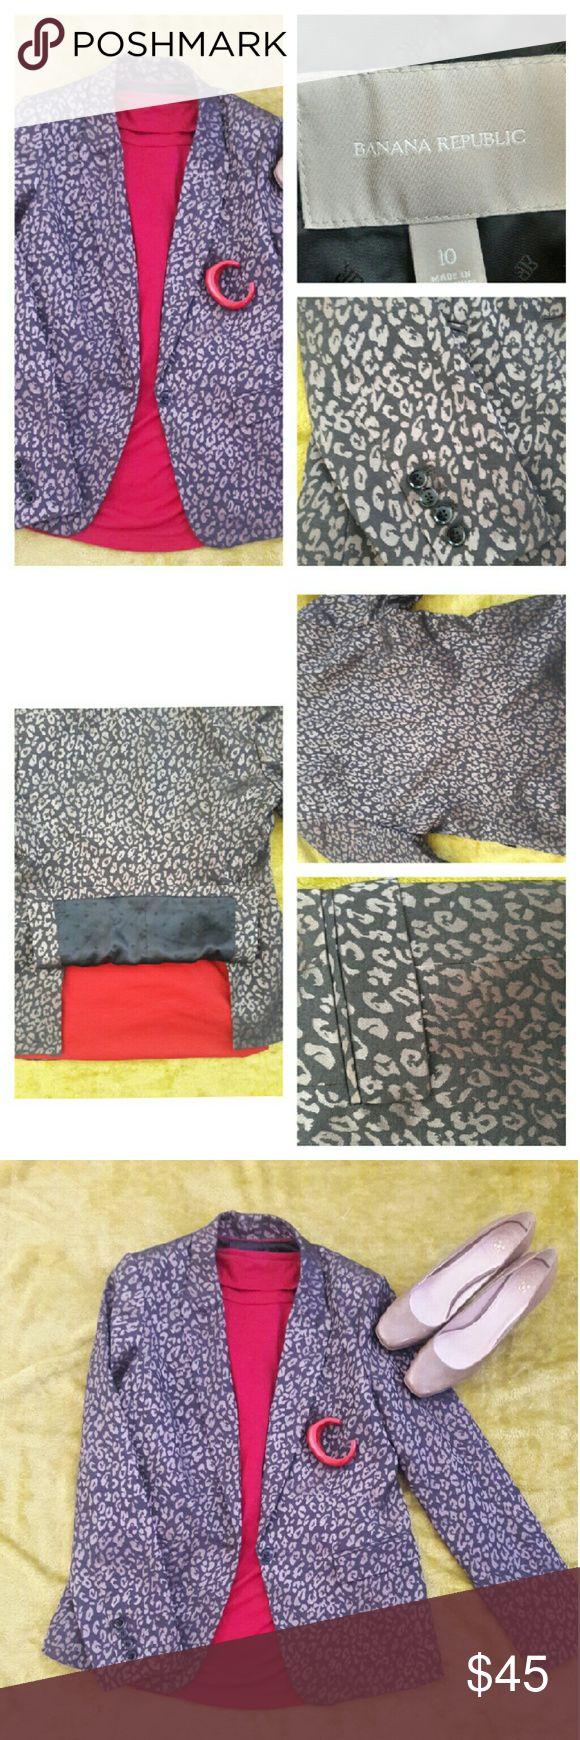 NWOT Banana Republic leopard cheetah print blazer NWOT Banana Republic dark brown leopard cheetah print blazer.   ?Size 10 ?Flair style back ?Fully lined ?Smoke free home?????? Banana Republic Jackets & Coats Blazers